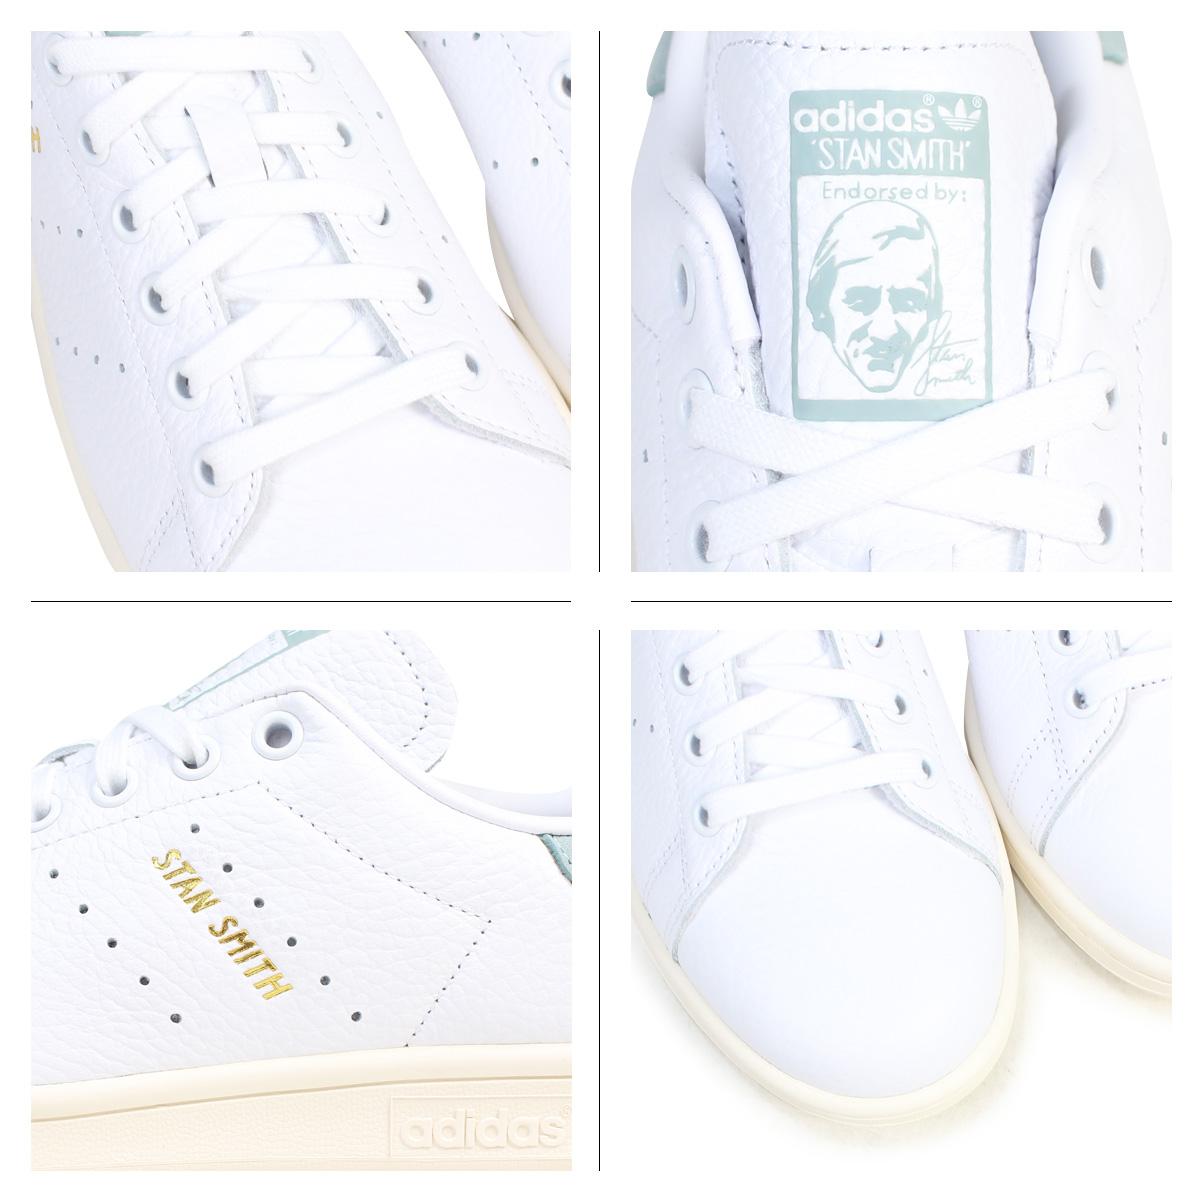 hot sale online 3a369 cbde6 adidas Stan Smith Adidas Originals sneakers STAN SMITH men gap Dis BZ0470  shoes white white